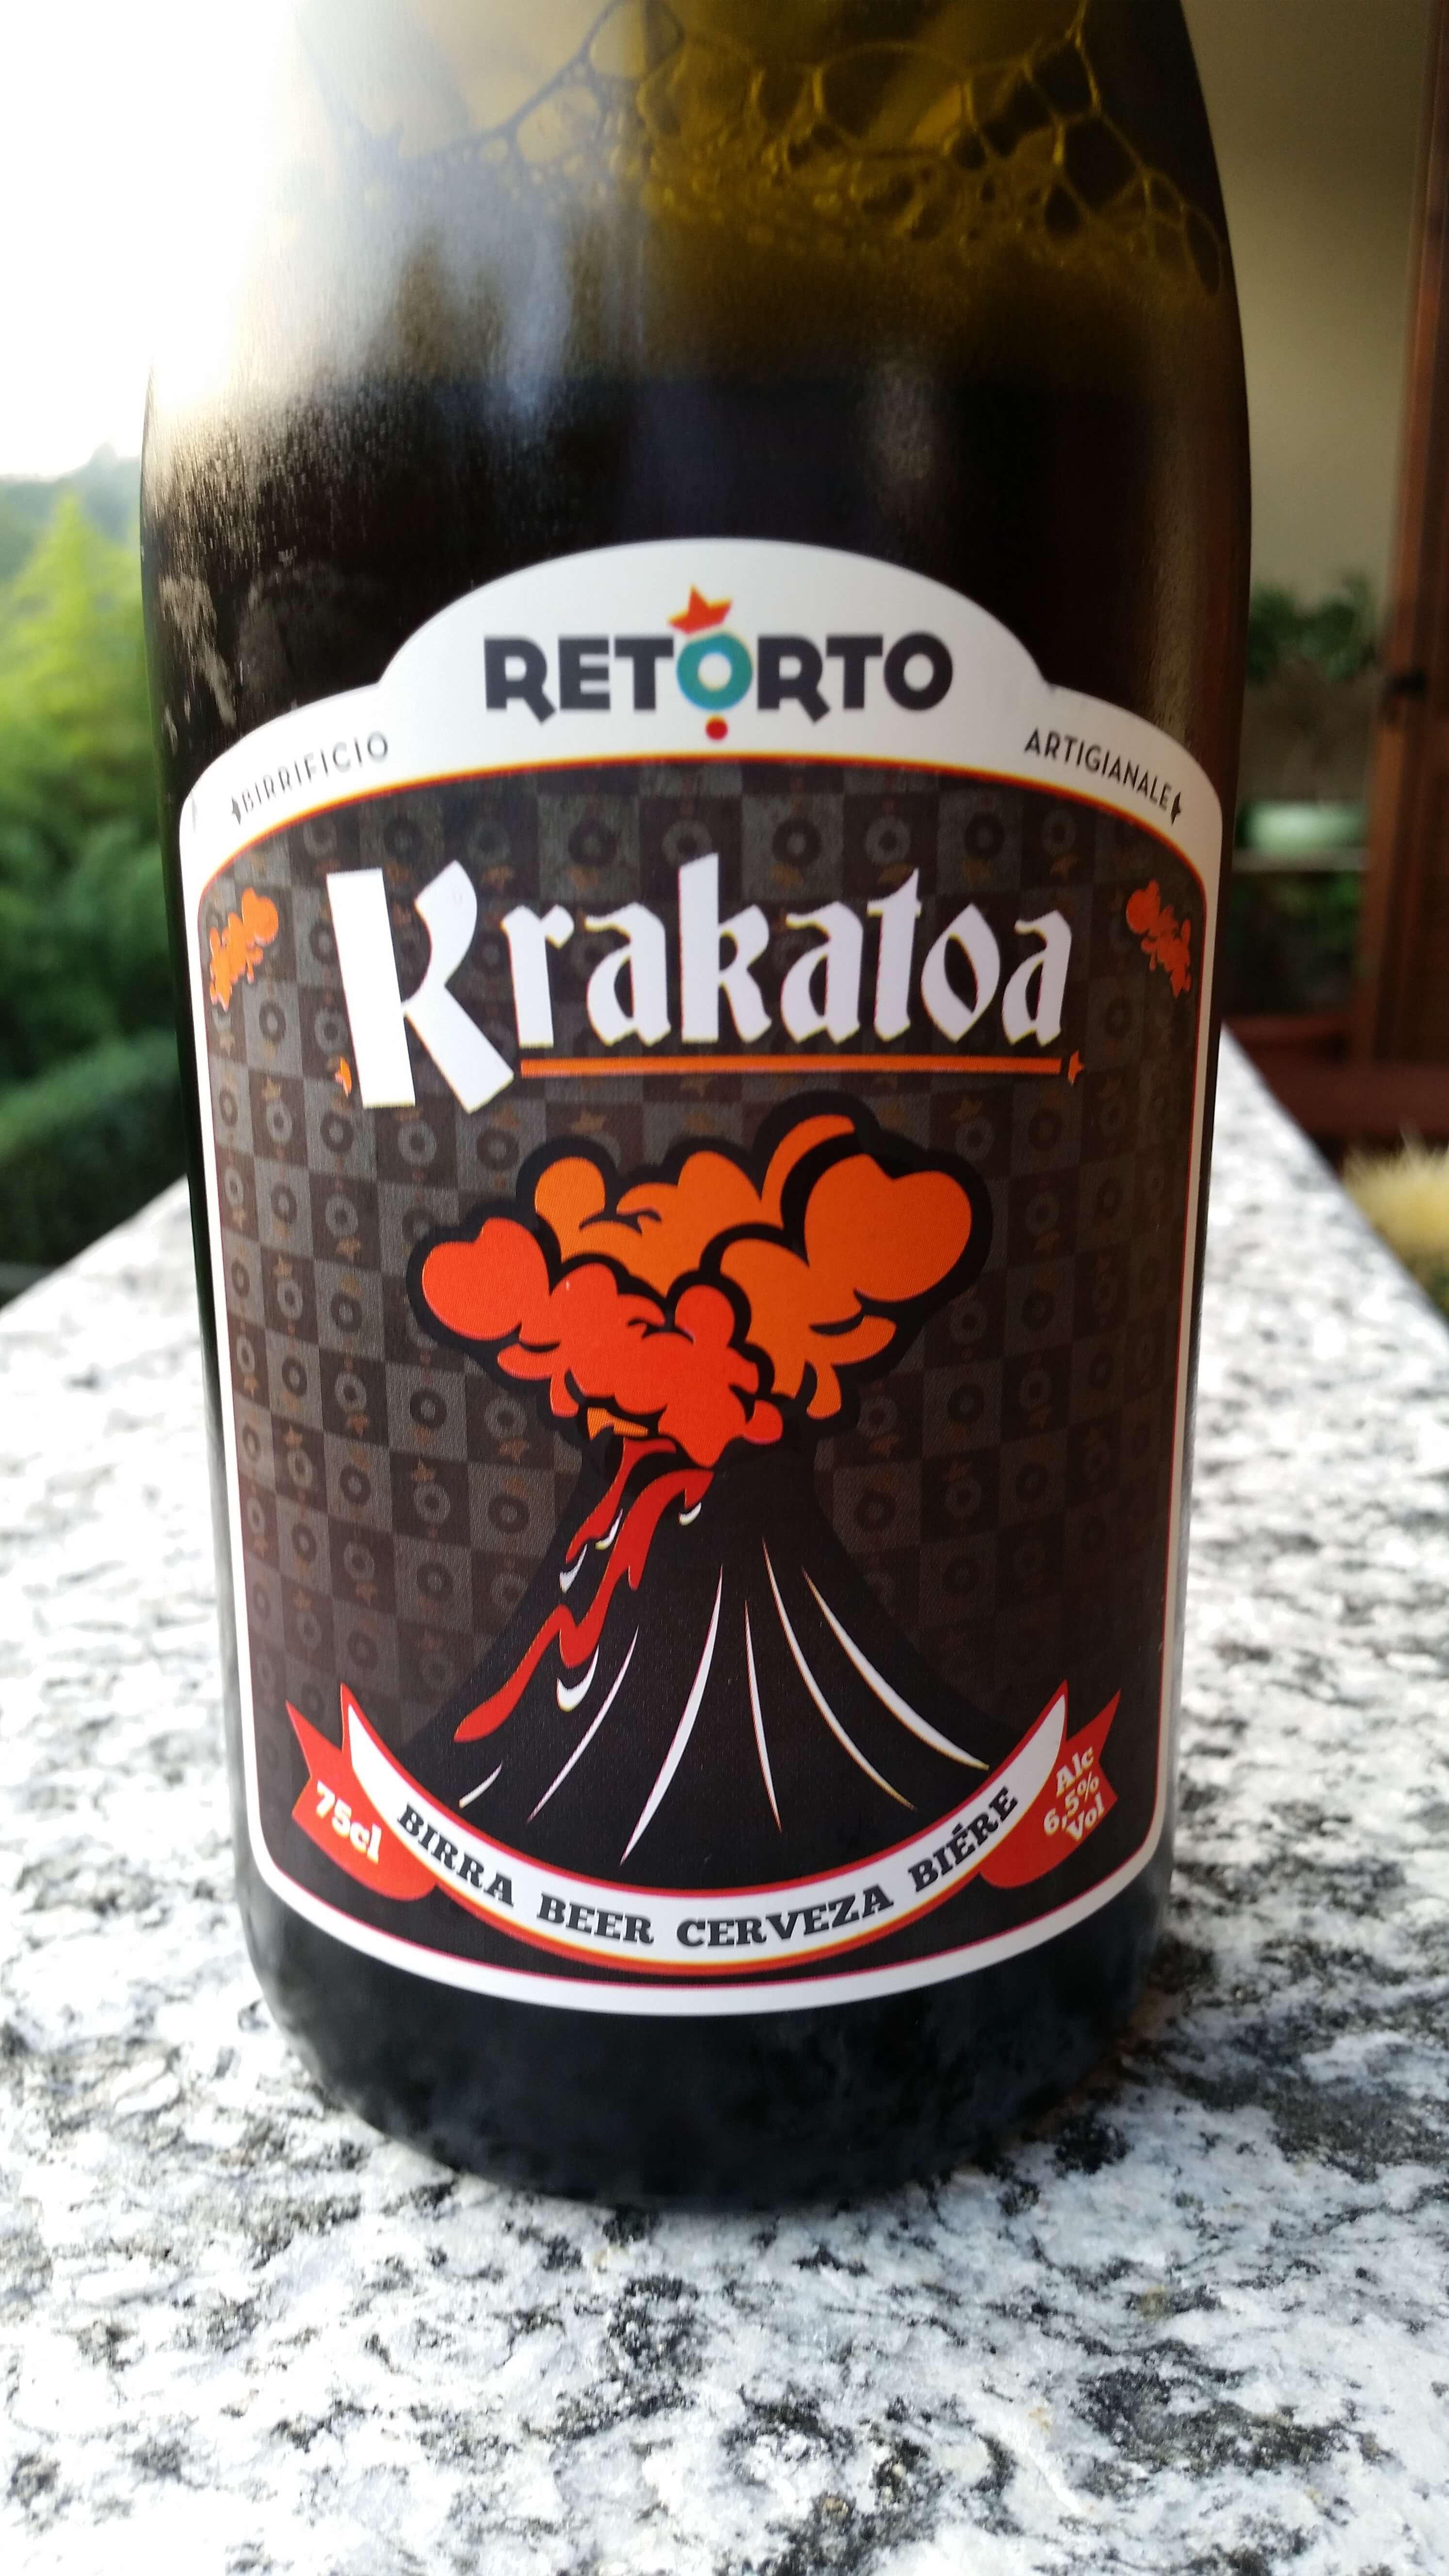 Retorto Krakatoa IPA